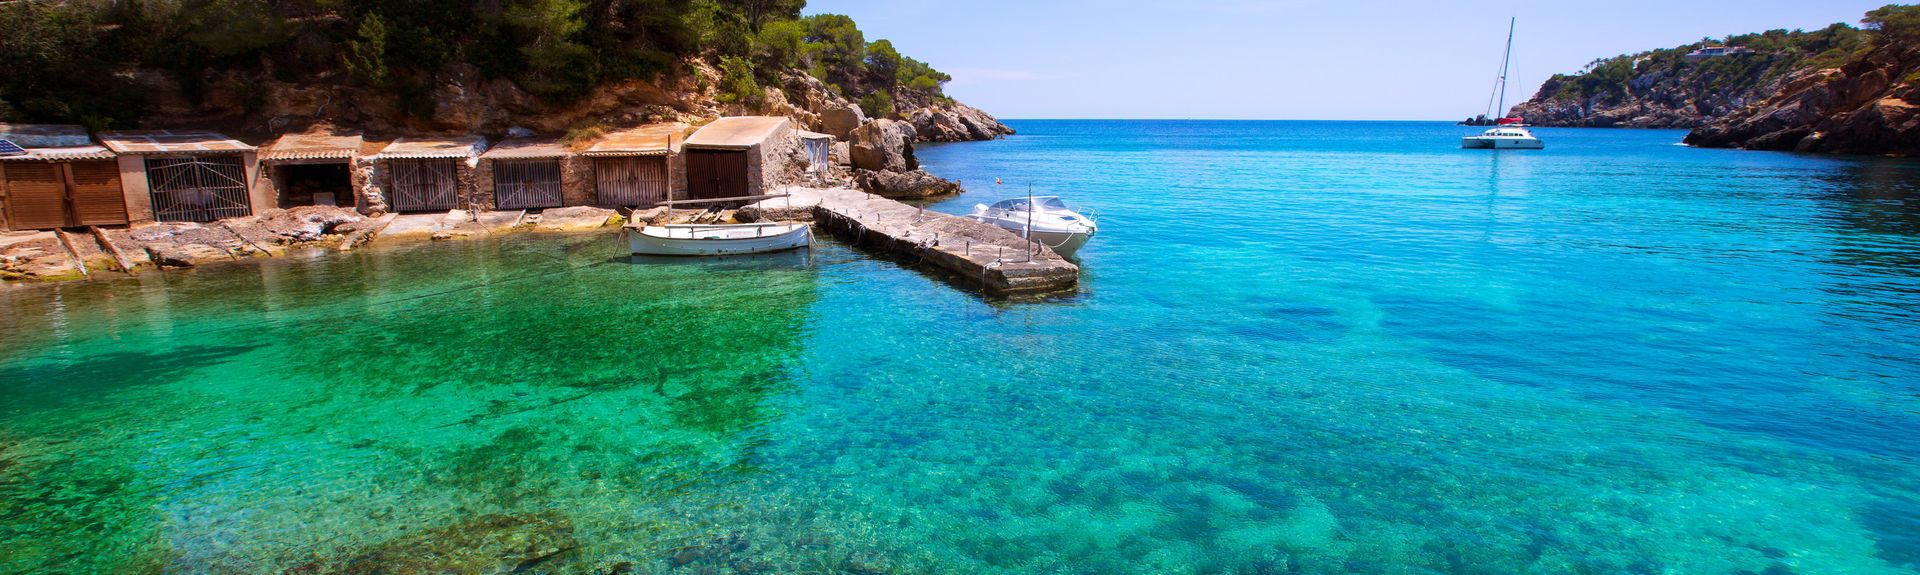 Santa Eulalia del Río, Isole Baleari, Spagna